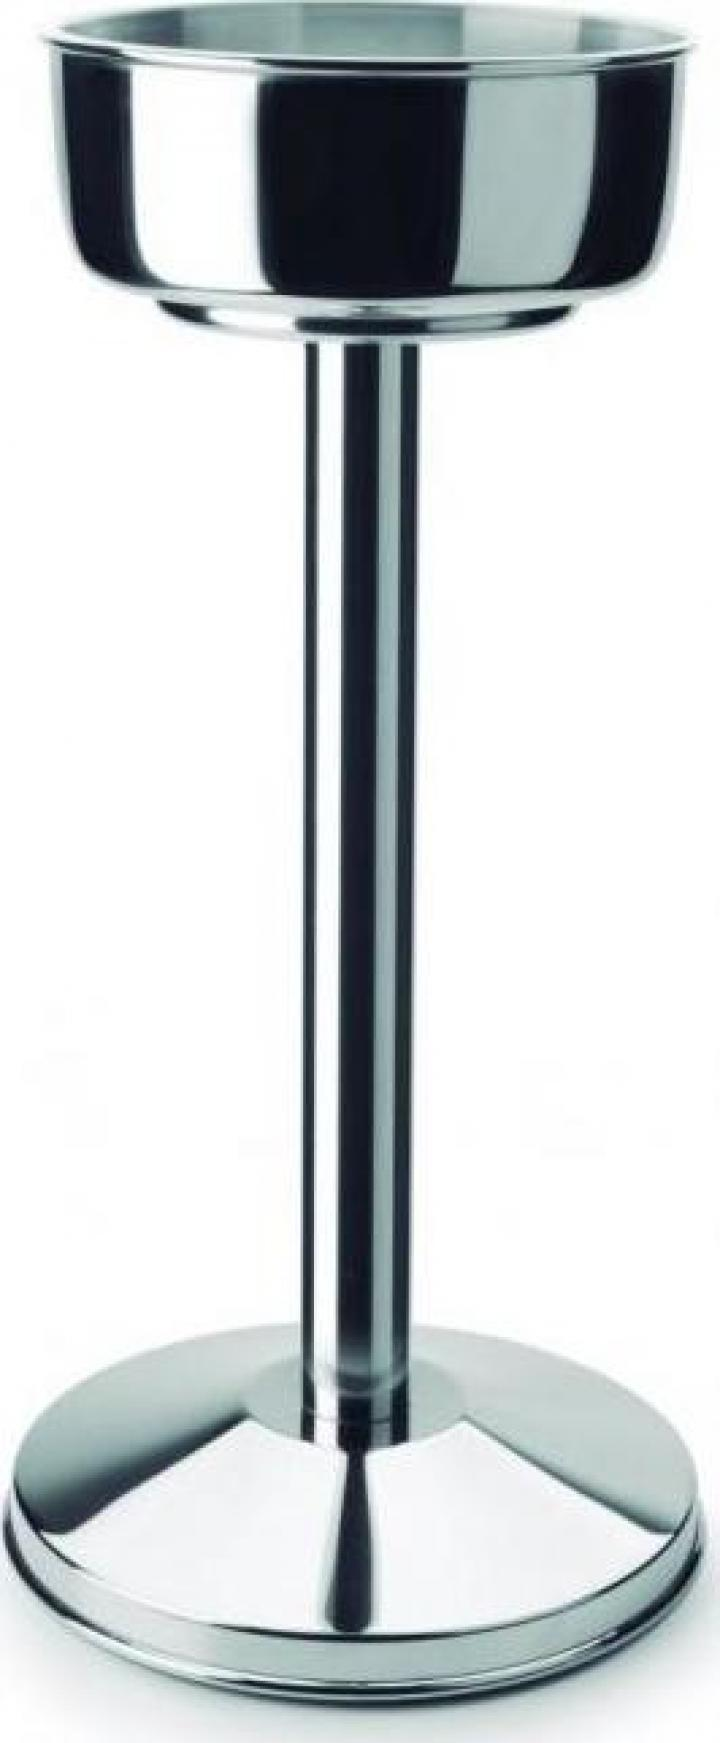 Picior inox pentru frapiera inox 5.5 litri